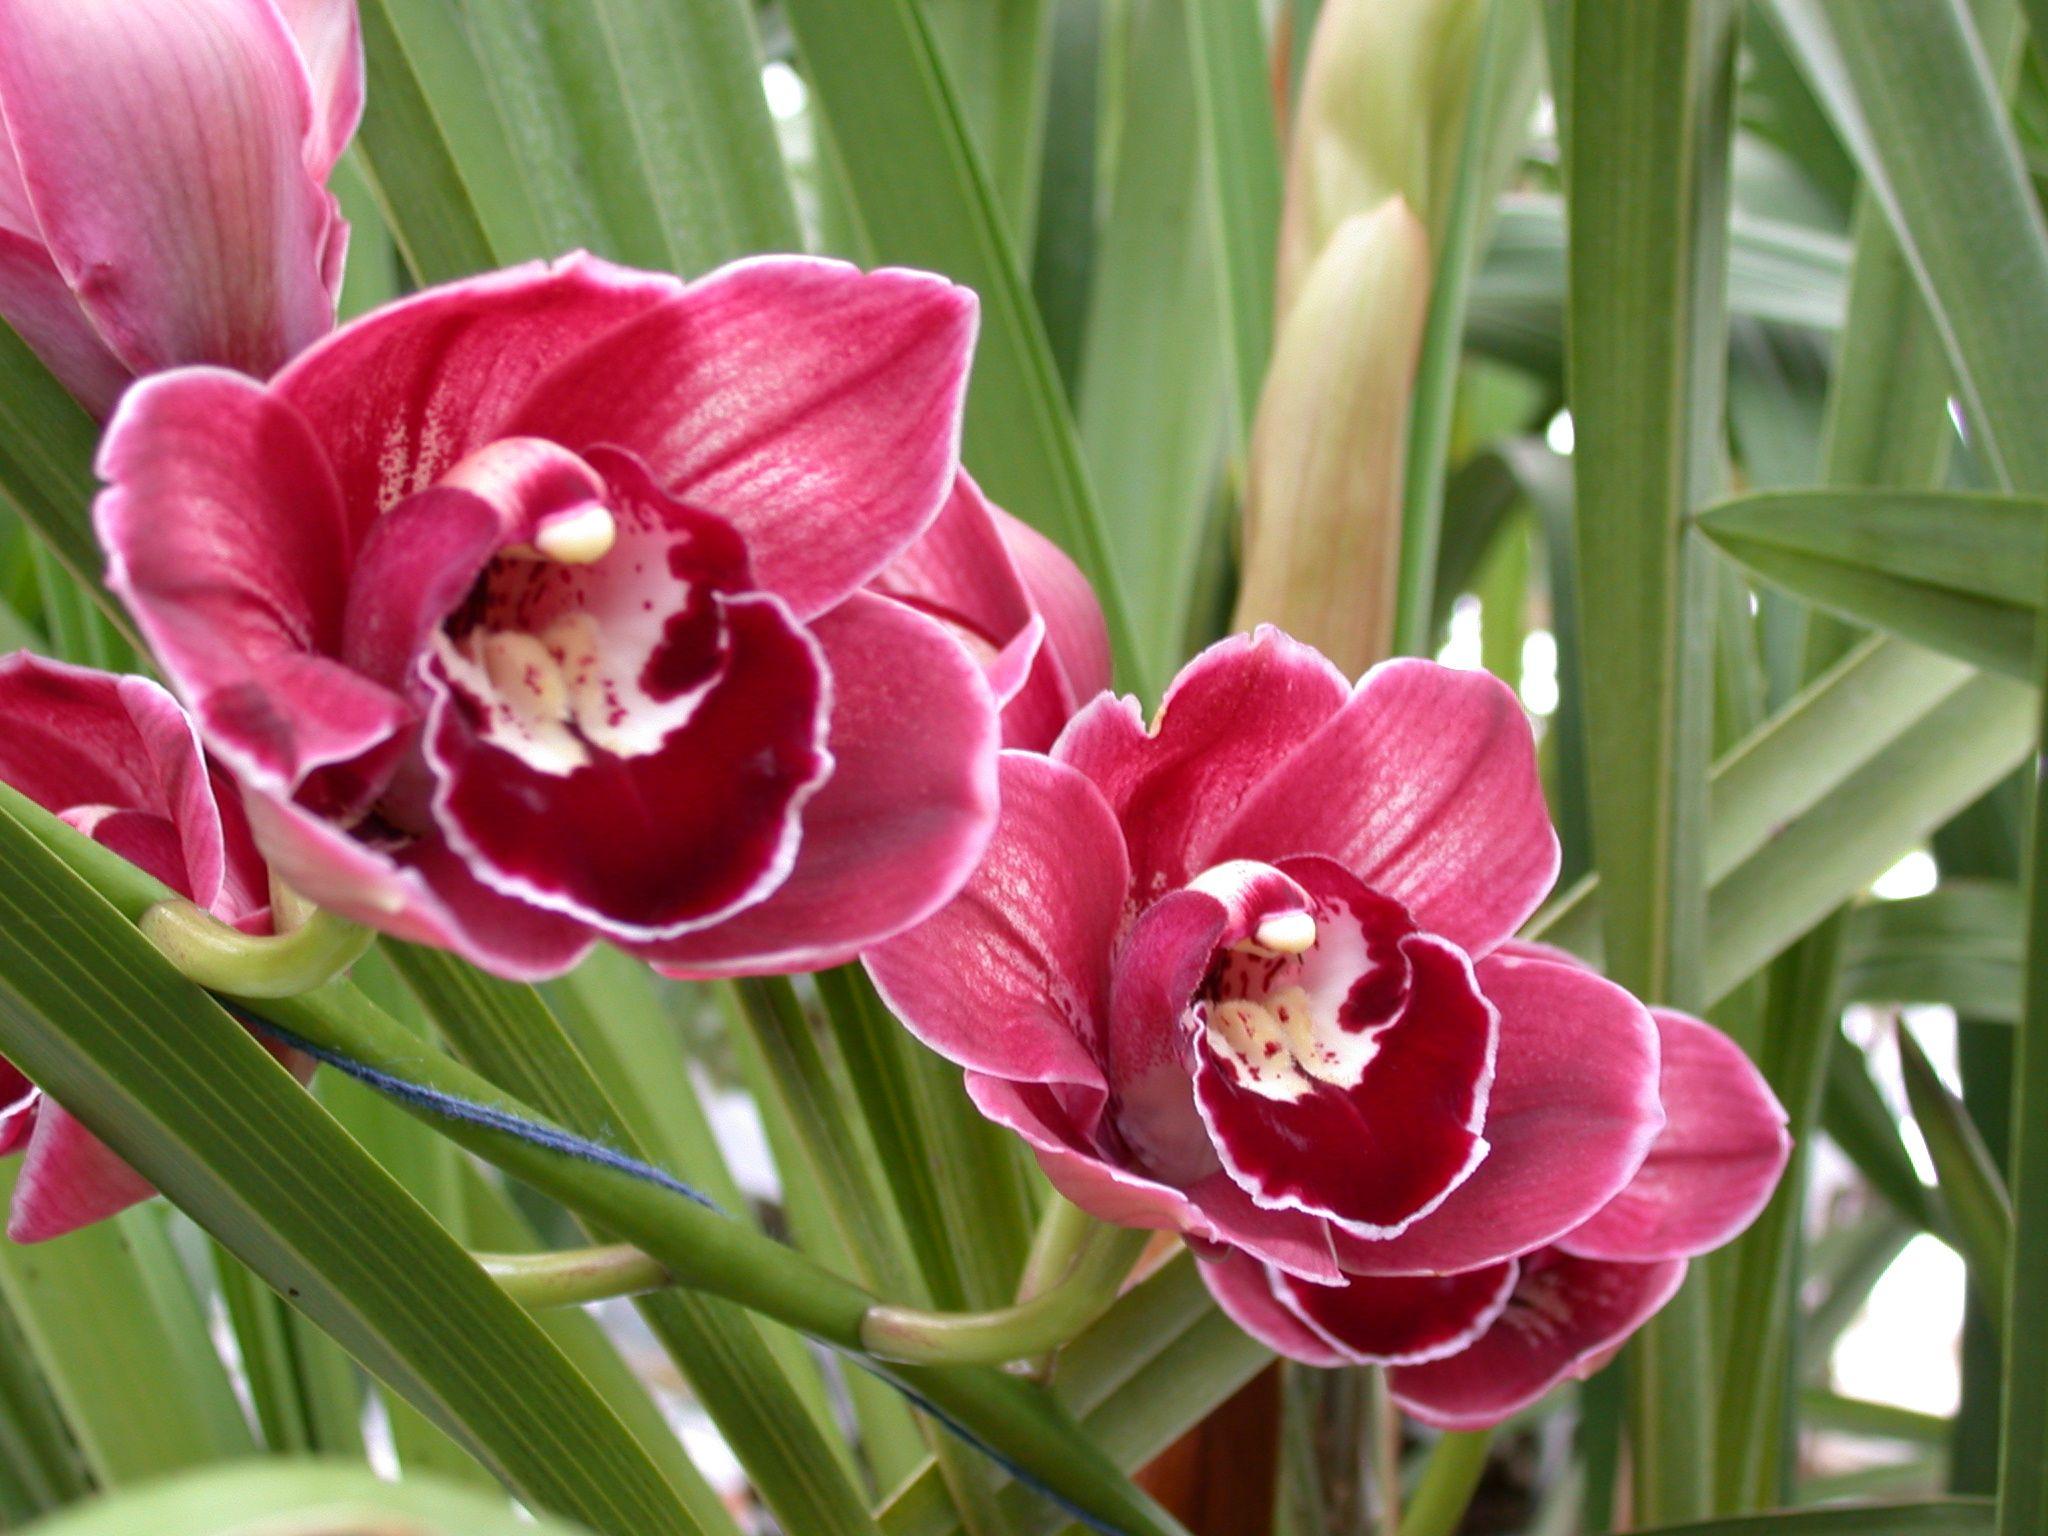 A And B Larsen Orchids Cymbidium Rolf Bolin Red Velvet Dscn4712 Jpg 2048 1536 Flower Garden Design Orchids Orchid Flower